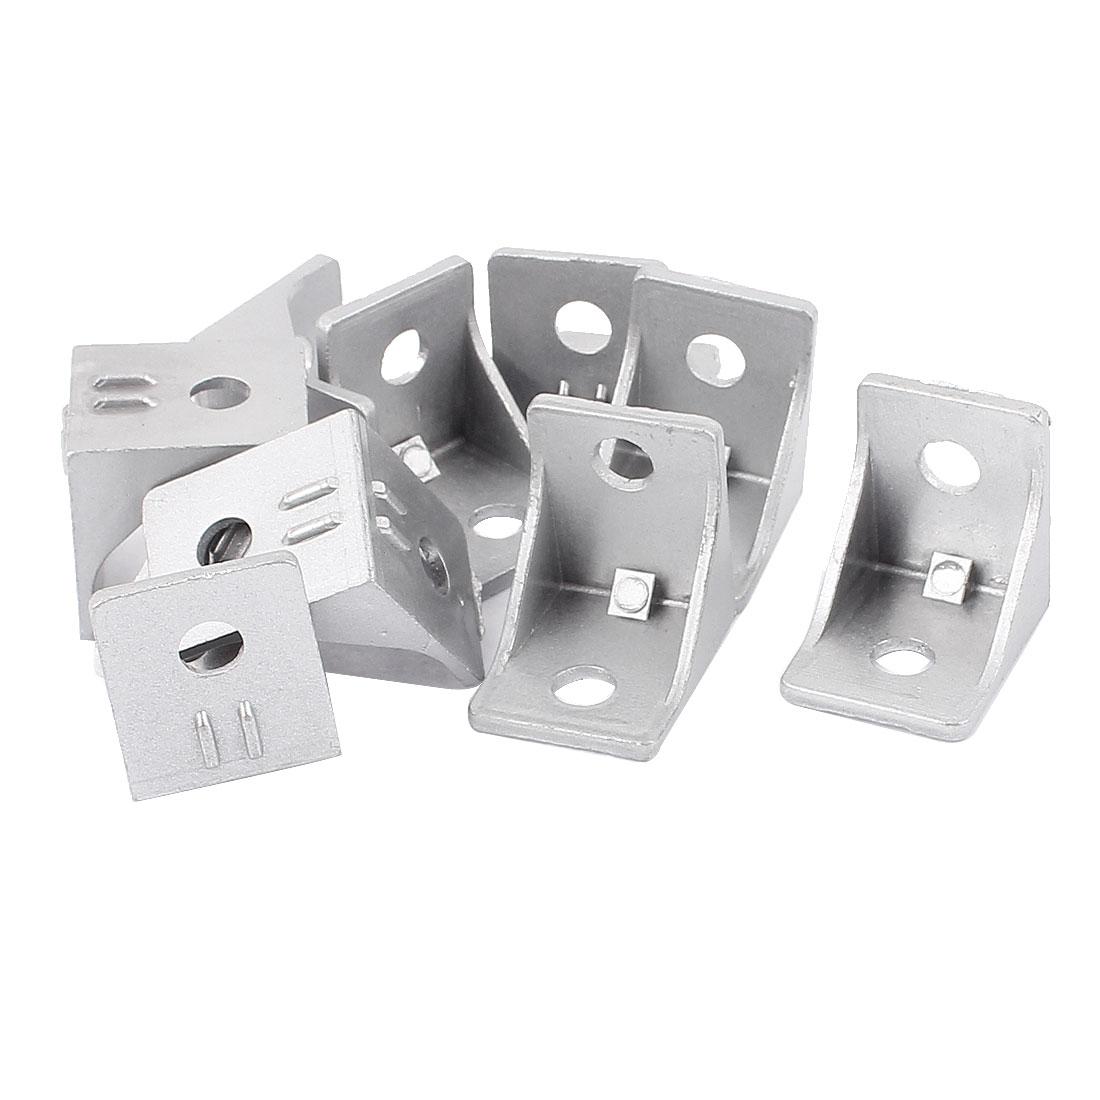 10pcs Aluminum Alloy Corner Braces Angle Brackets Supports Silver Tone